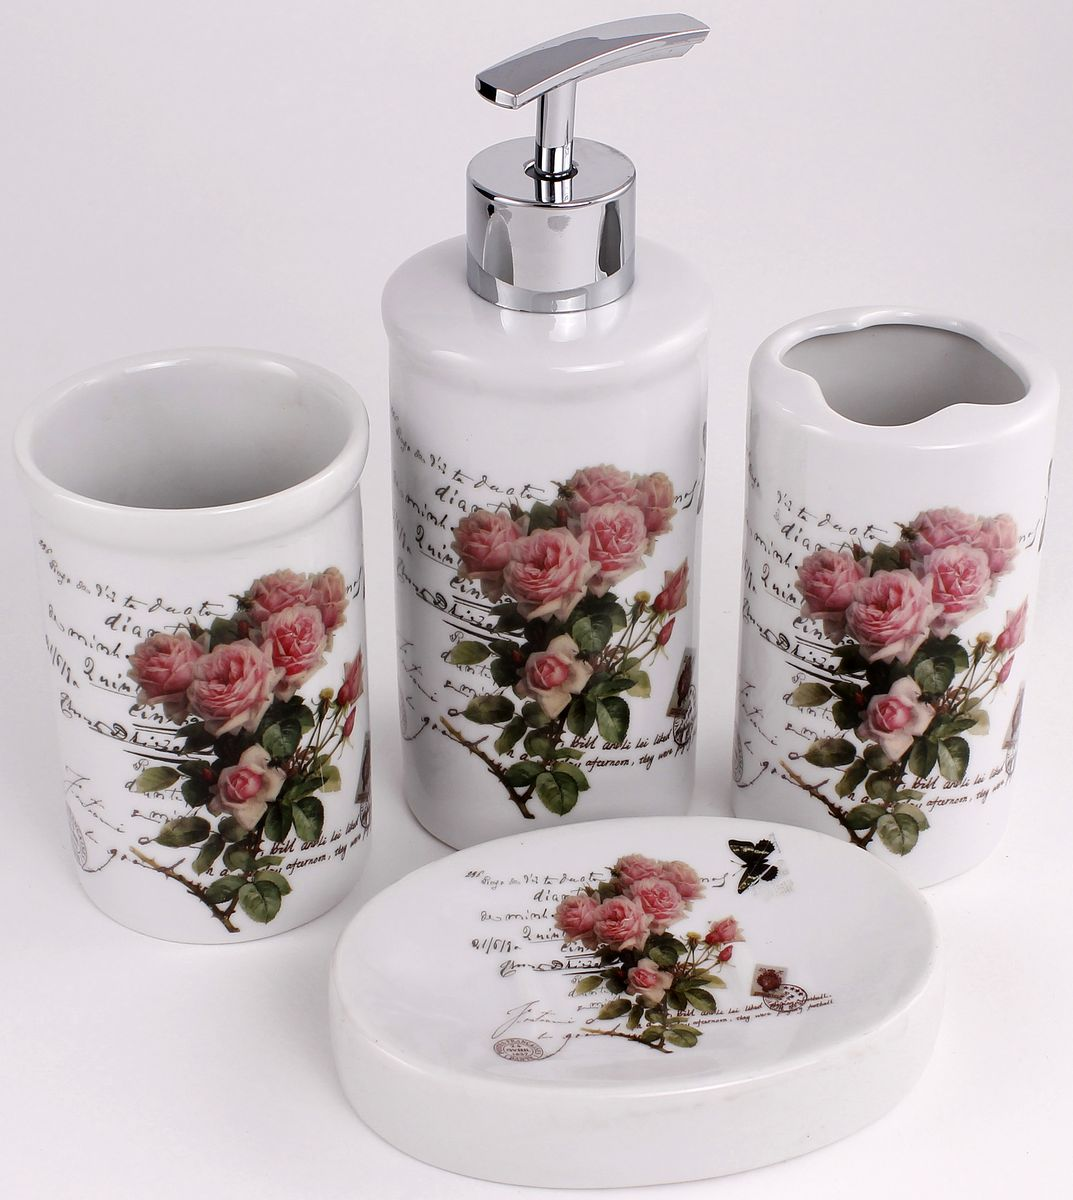 Набор для ванной Patricia, 4 предмета, цвет: белый, серый. IM99-2385/2 шкатулка поднос patricia цвет коричневый 23 х 28 х 20 см im99 2635